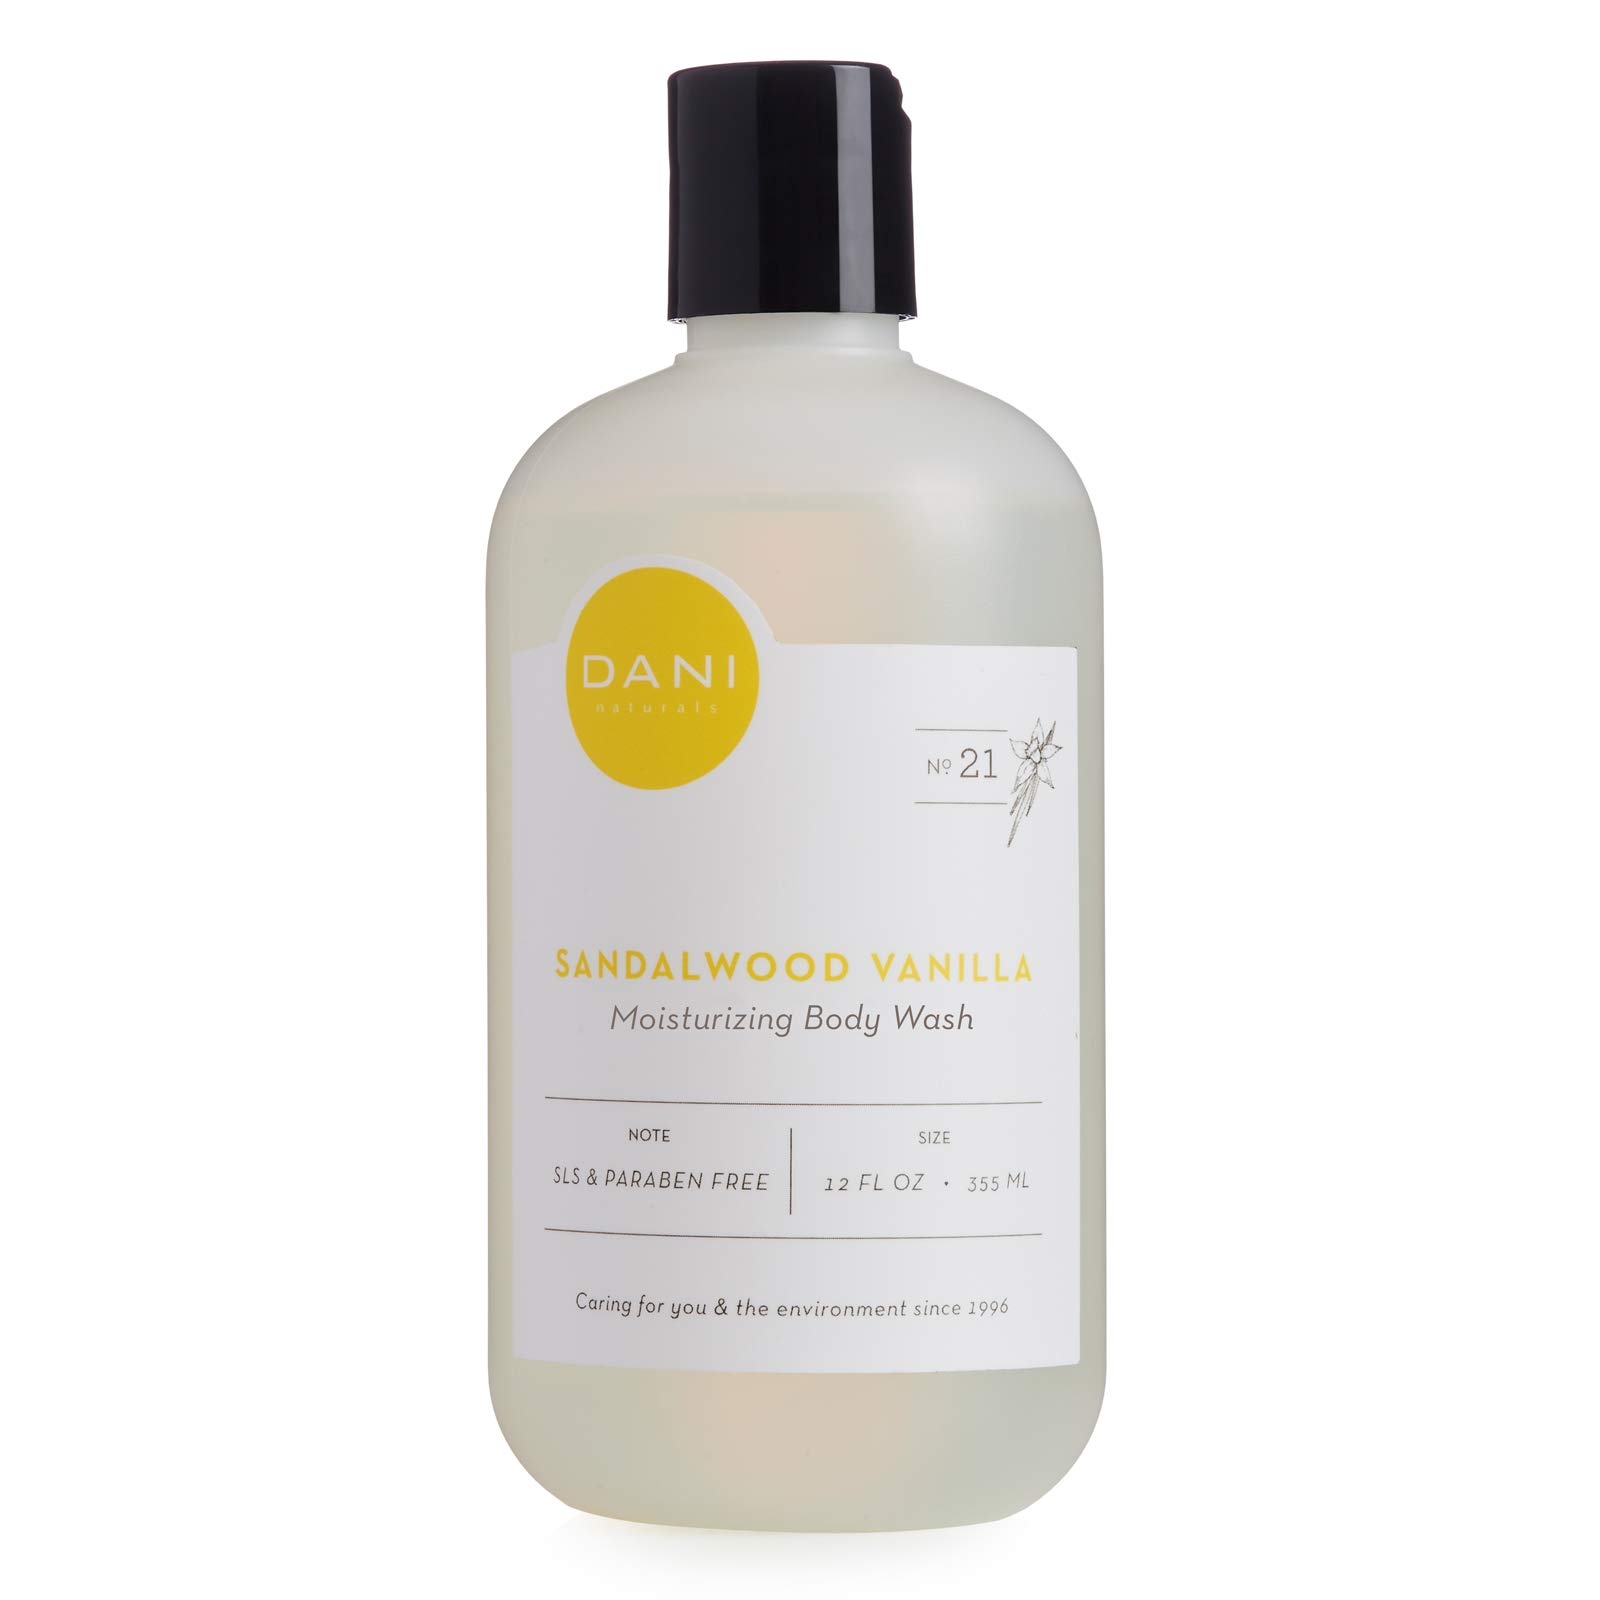 Moisturizing Body Wash By DANI Naturals - Warm Sandalwood Vanilla Aromatherapy - Organic Aloe Vera & Natural Glycerin - Paraben & Sulfate Free Shower Gel - For Men & Women - 12 Ounce Bottle